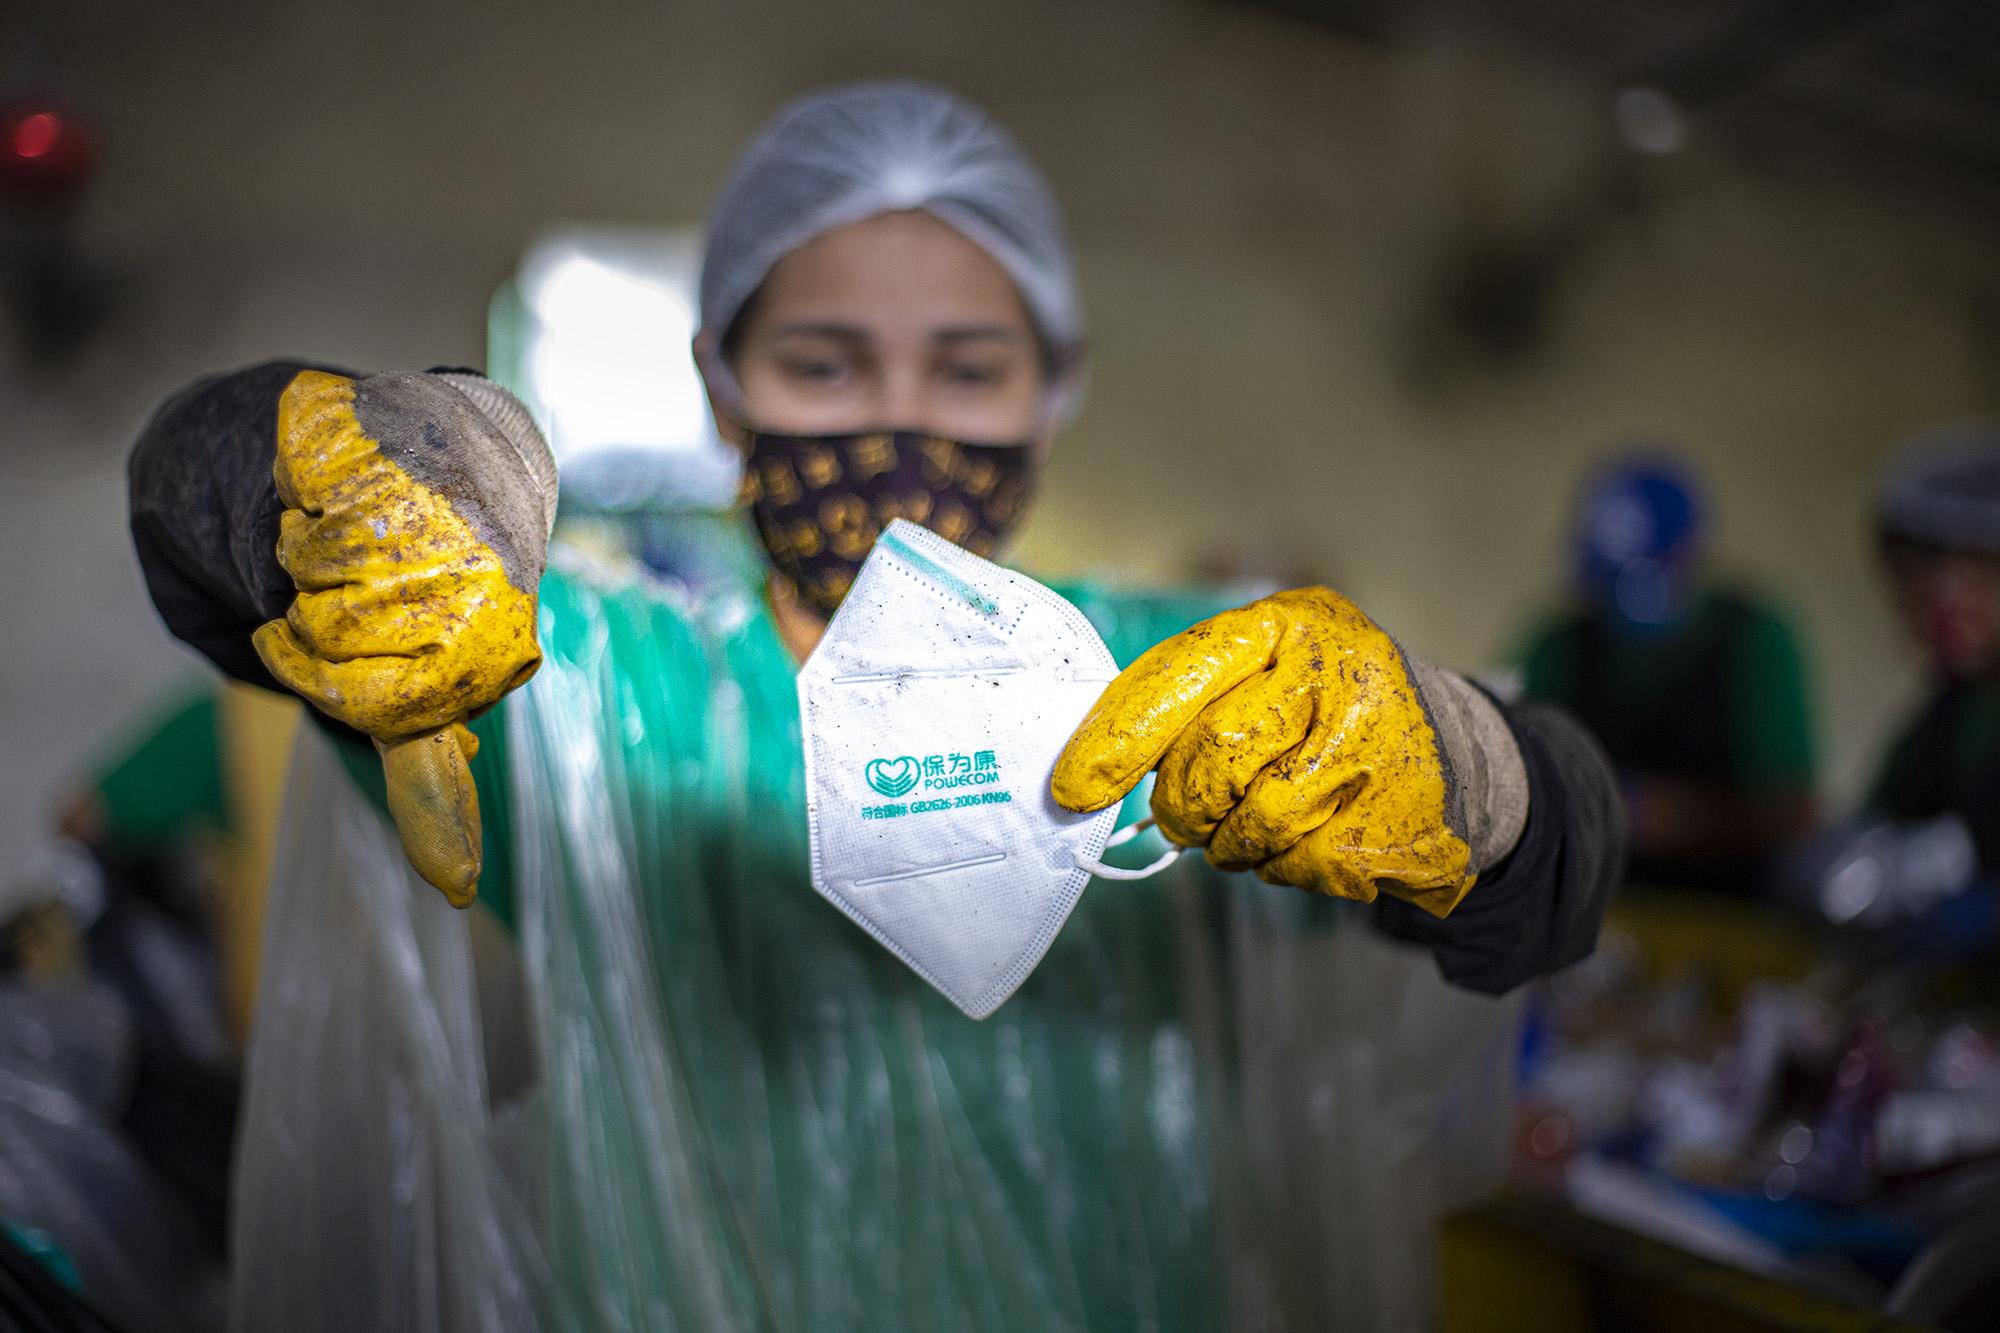 Descarte incorreto de máscaras e luvas descartáveis pode contaminar trabalhadores da cooperativa de reciclagem